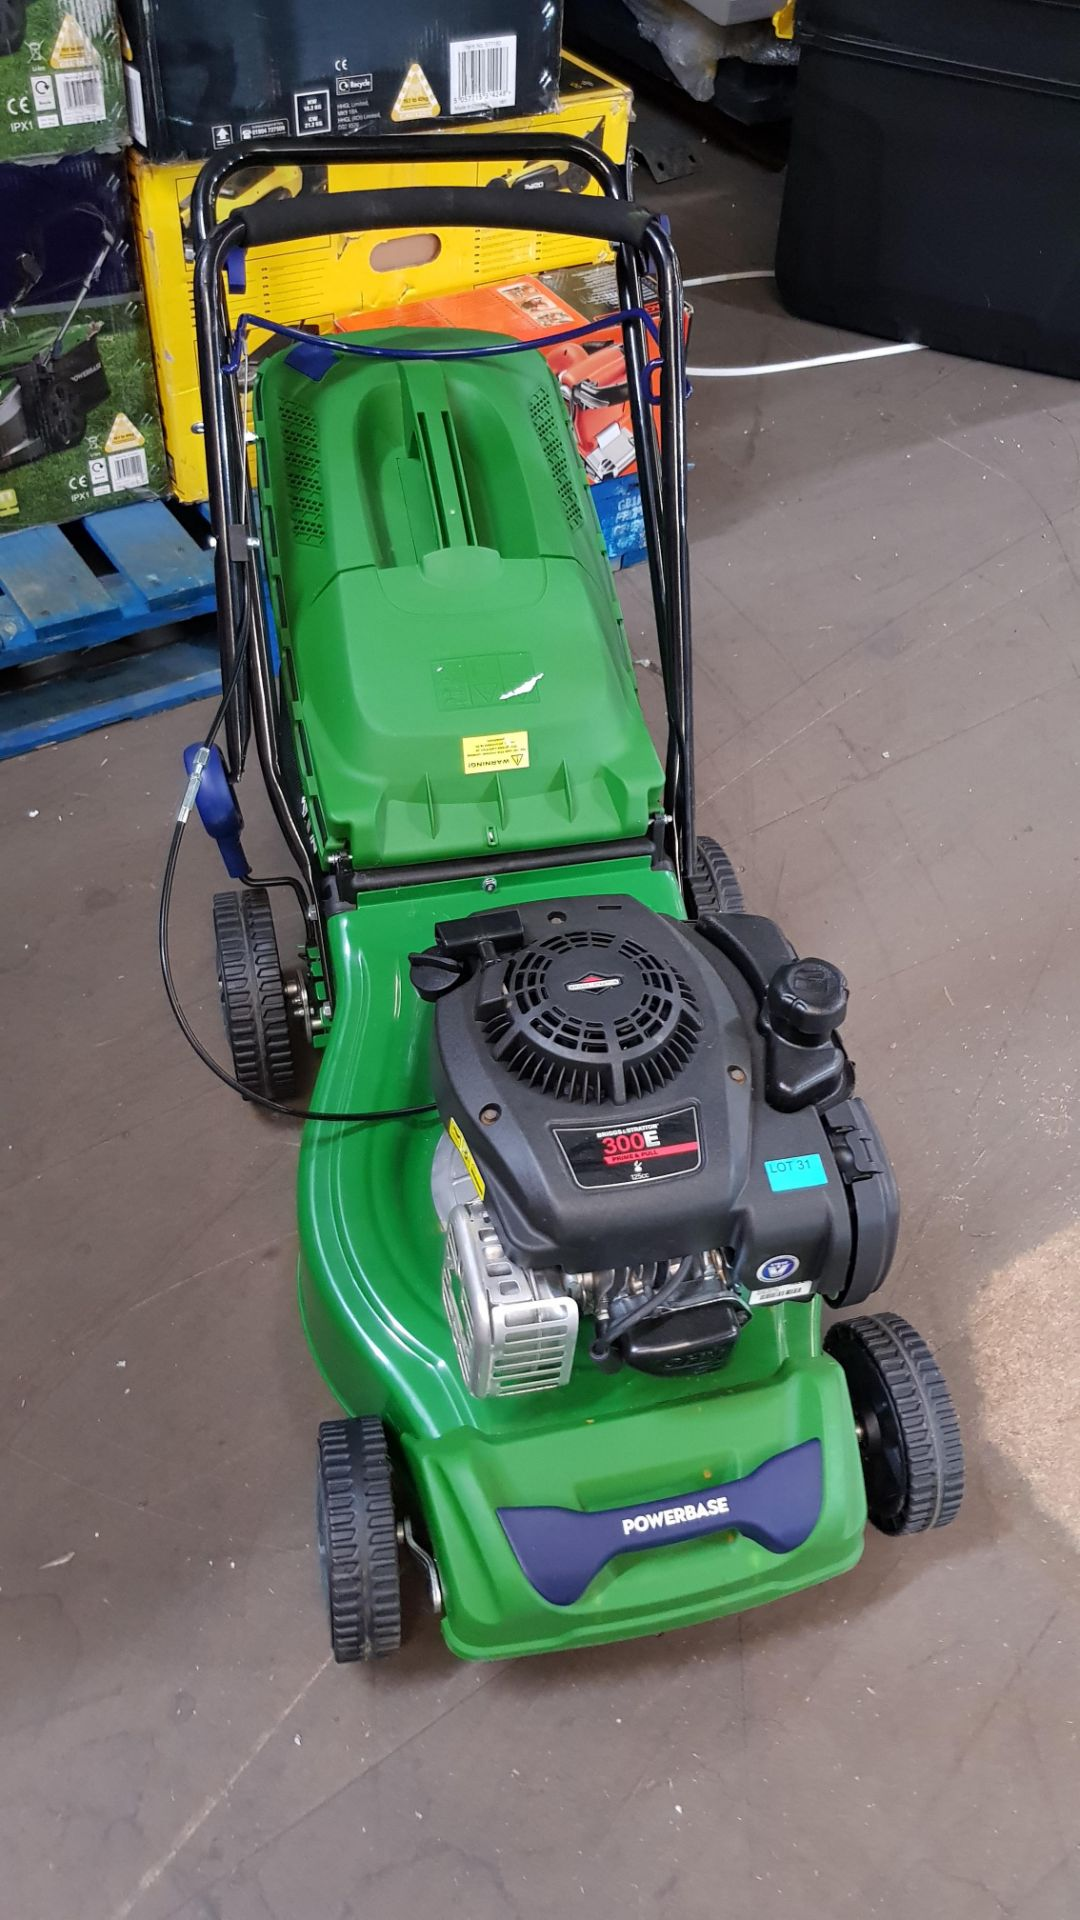 (P10) 1x Powerbase 41cm 125cc Push Petrol Rotary Lawn Mower (XSS41D) RRP £199. New, Clean Unused I - Image 3 of 8